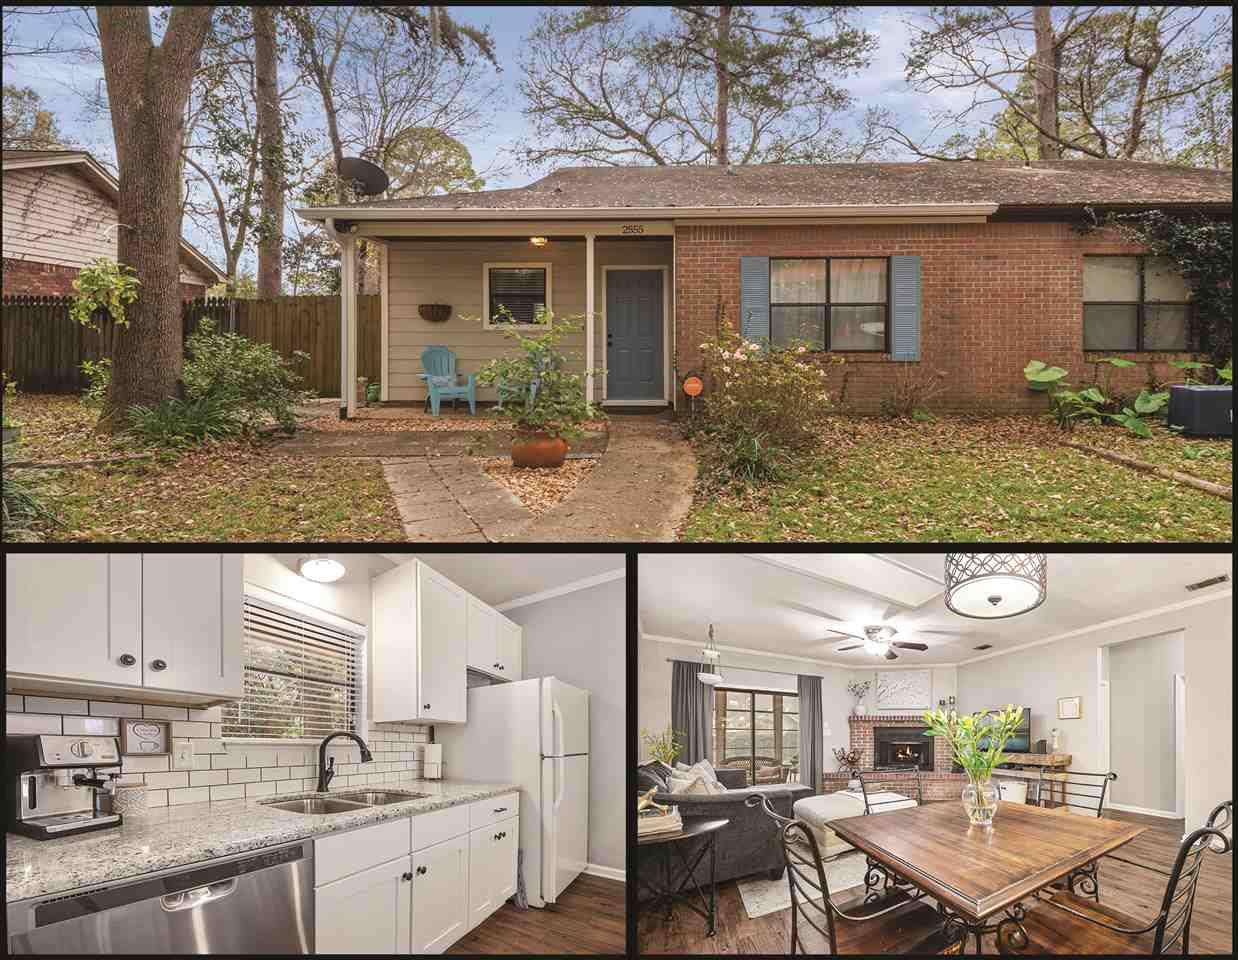 2555 Panther Creek Road, Tallahassee, FL 32308 - MLS#: 329200